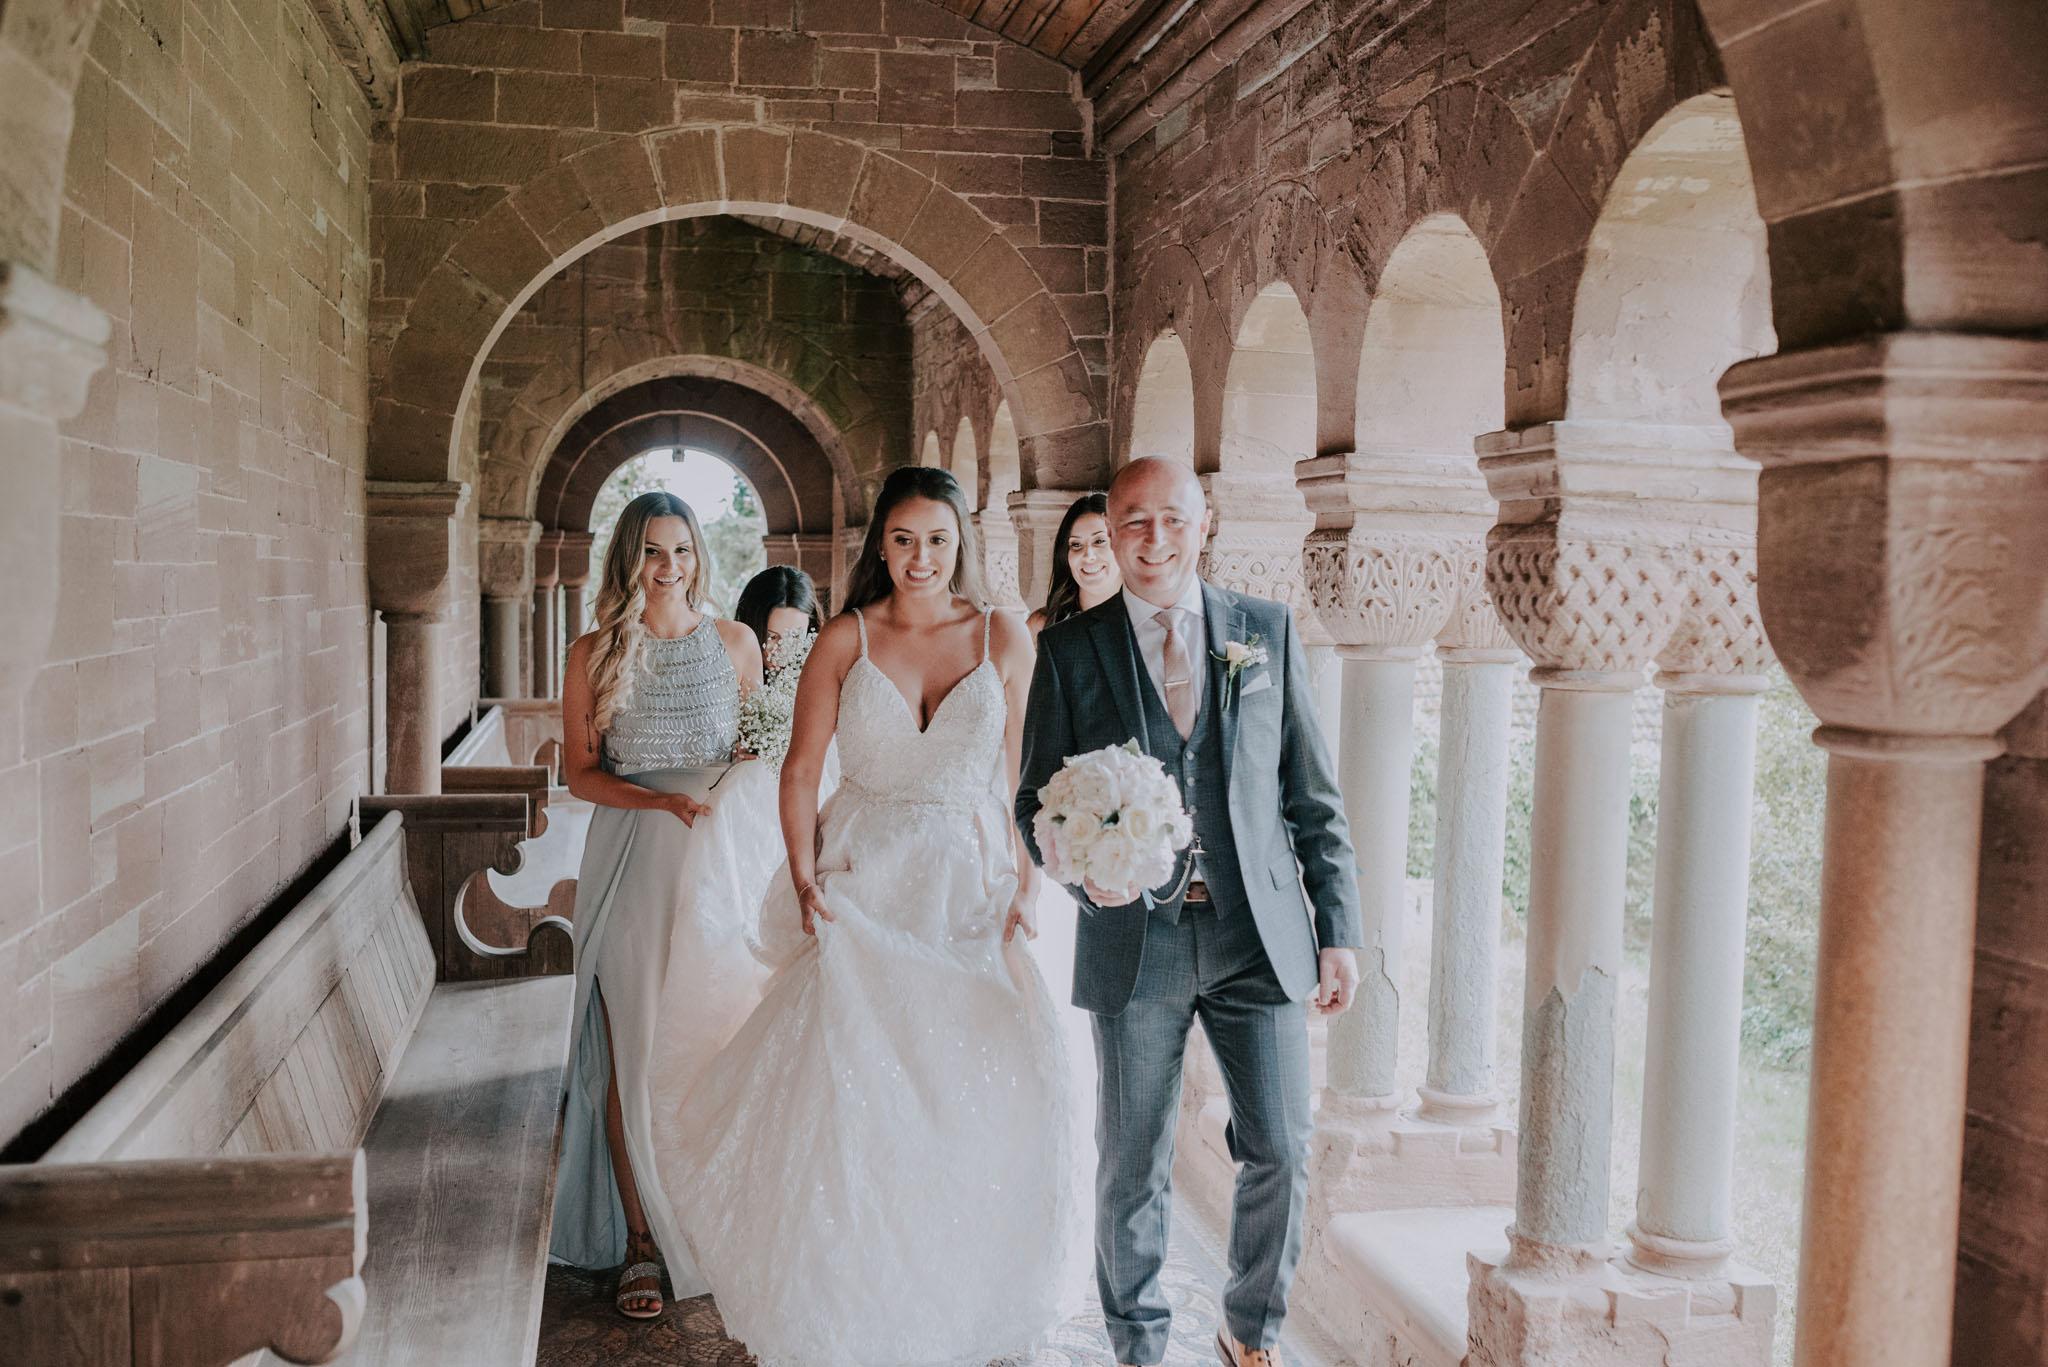 wedding-photographer-glewstone-court-hereford-scott-stockwell-photography149.jpg